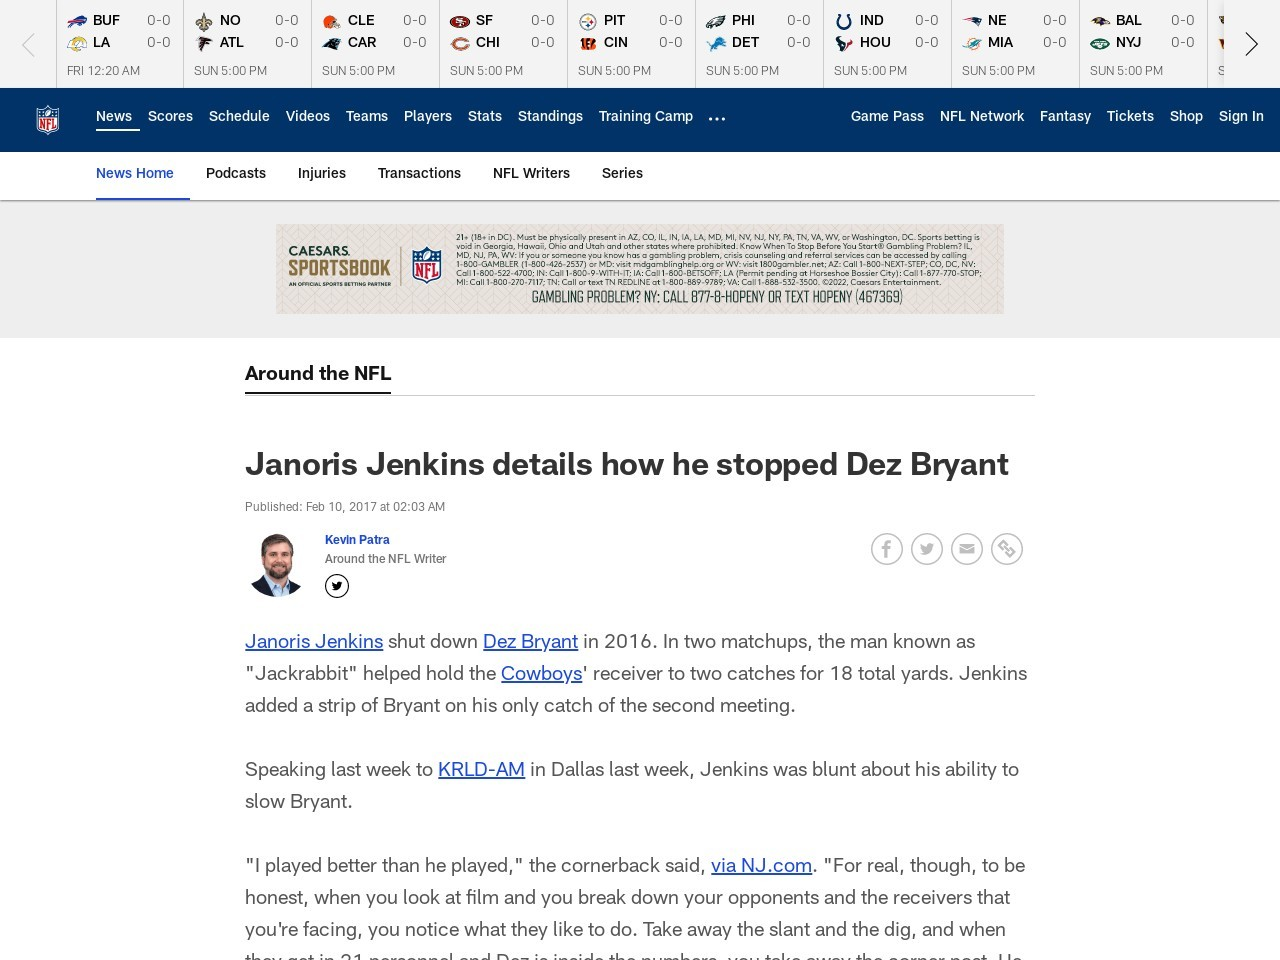 Janoris Jenkins details how he stopped Dez Bryant